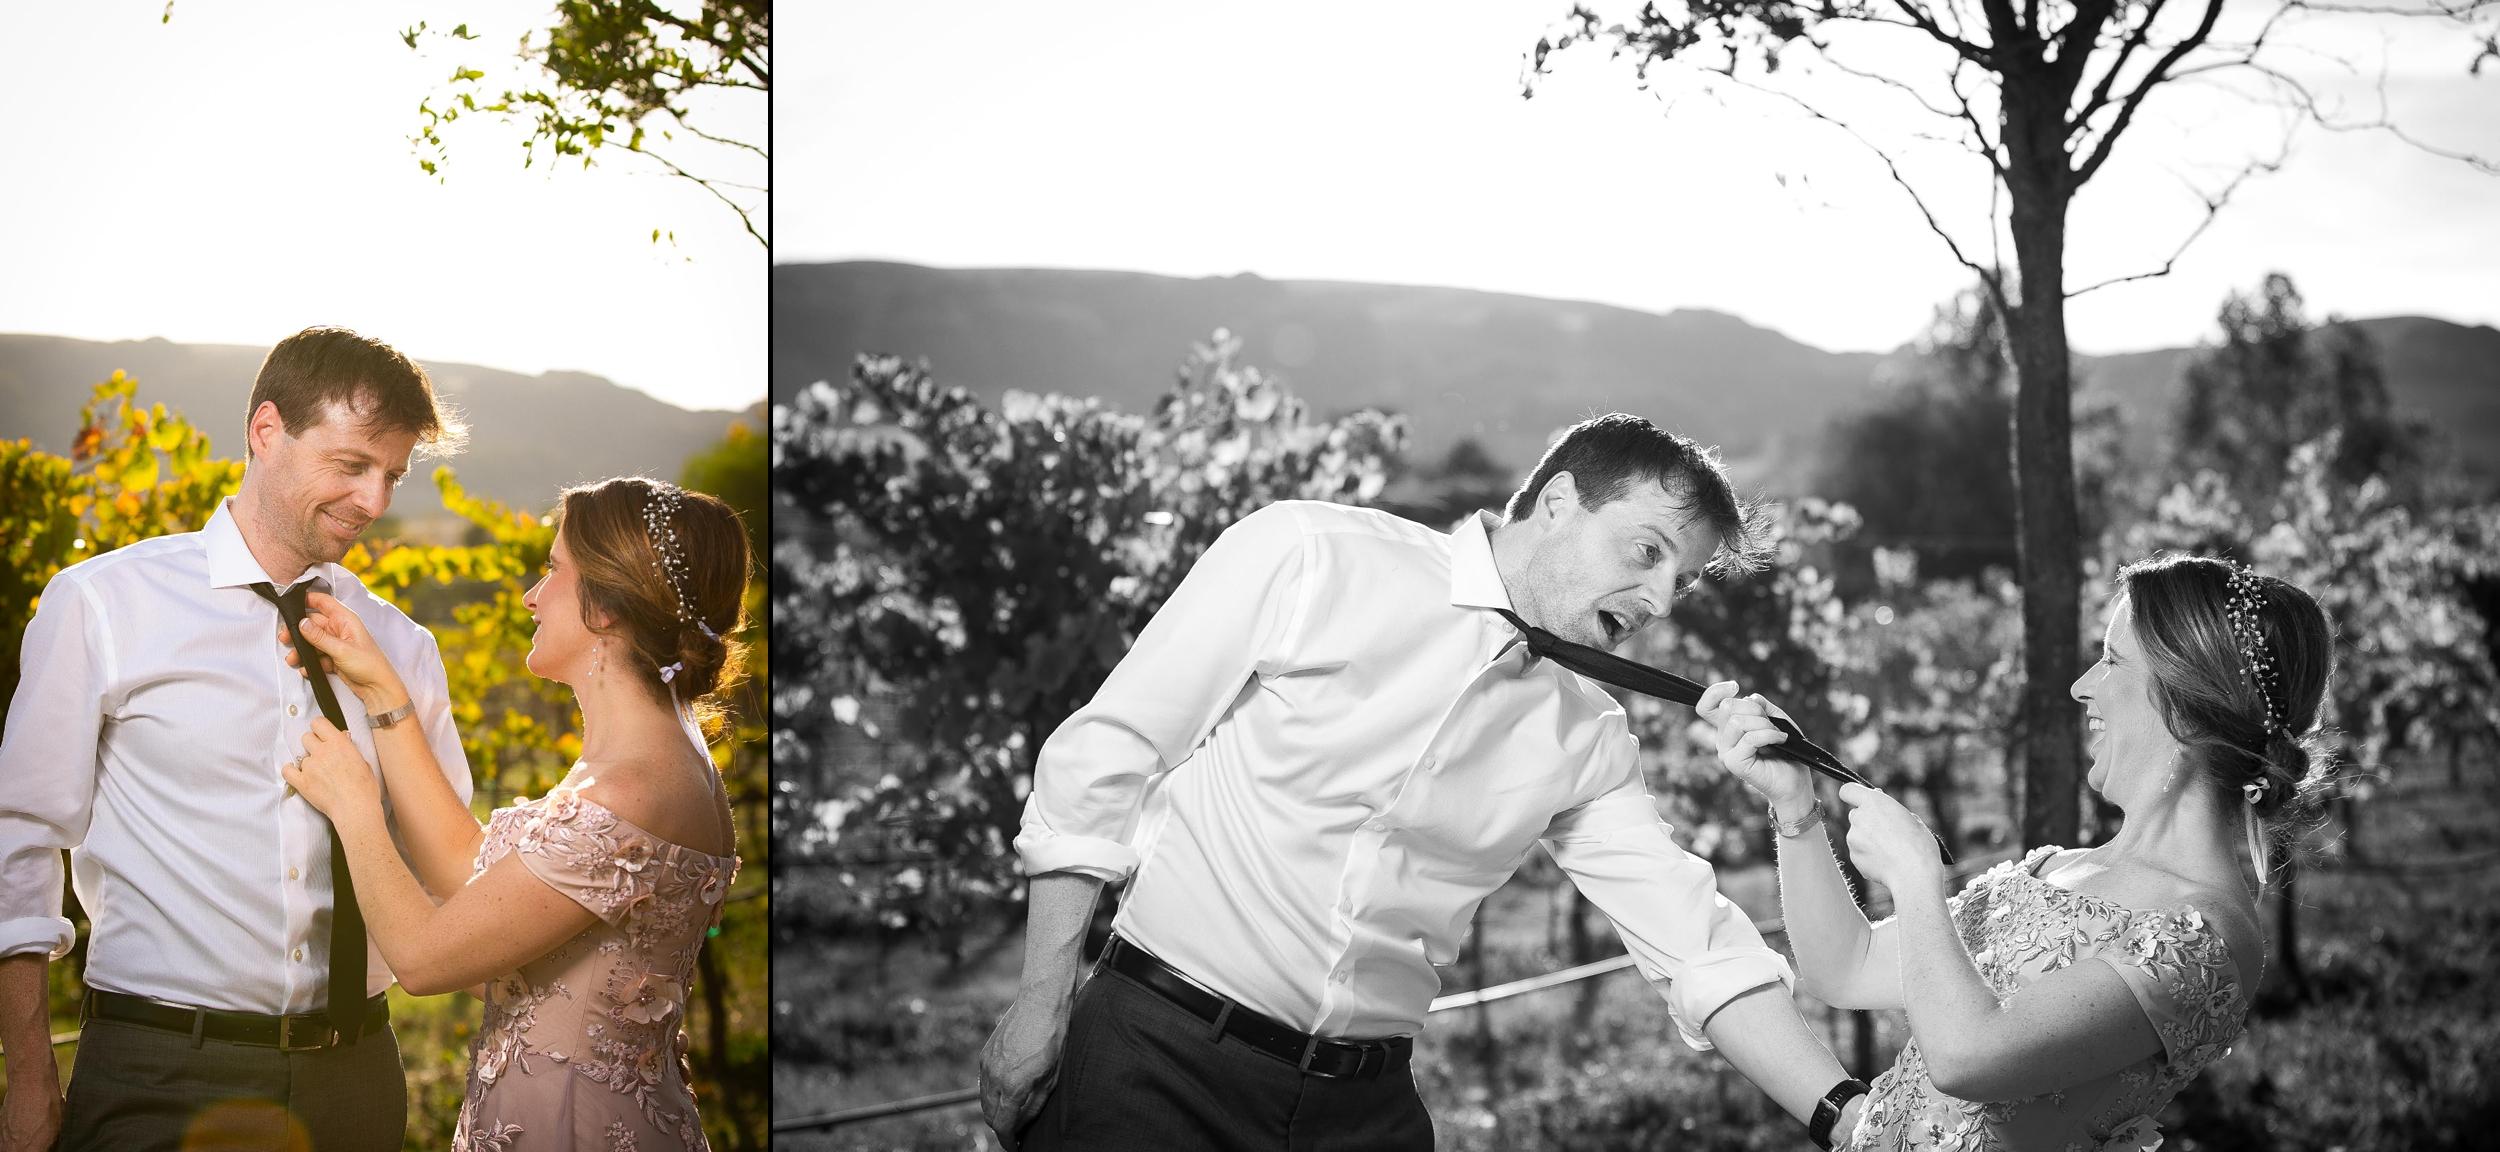 Jacuzzi Family Vineyards Wedding Photos-13.jpg